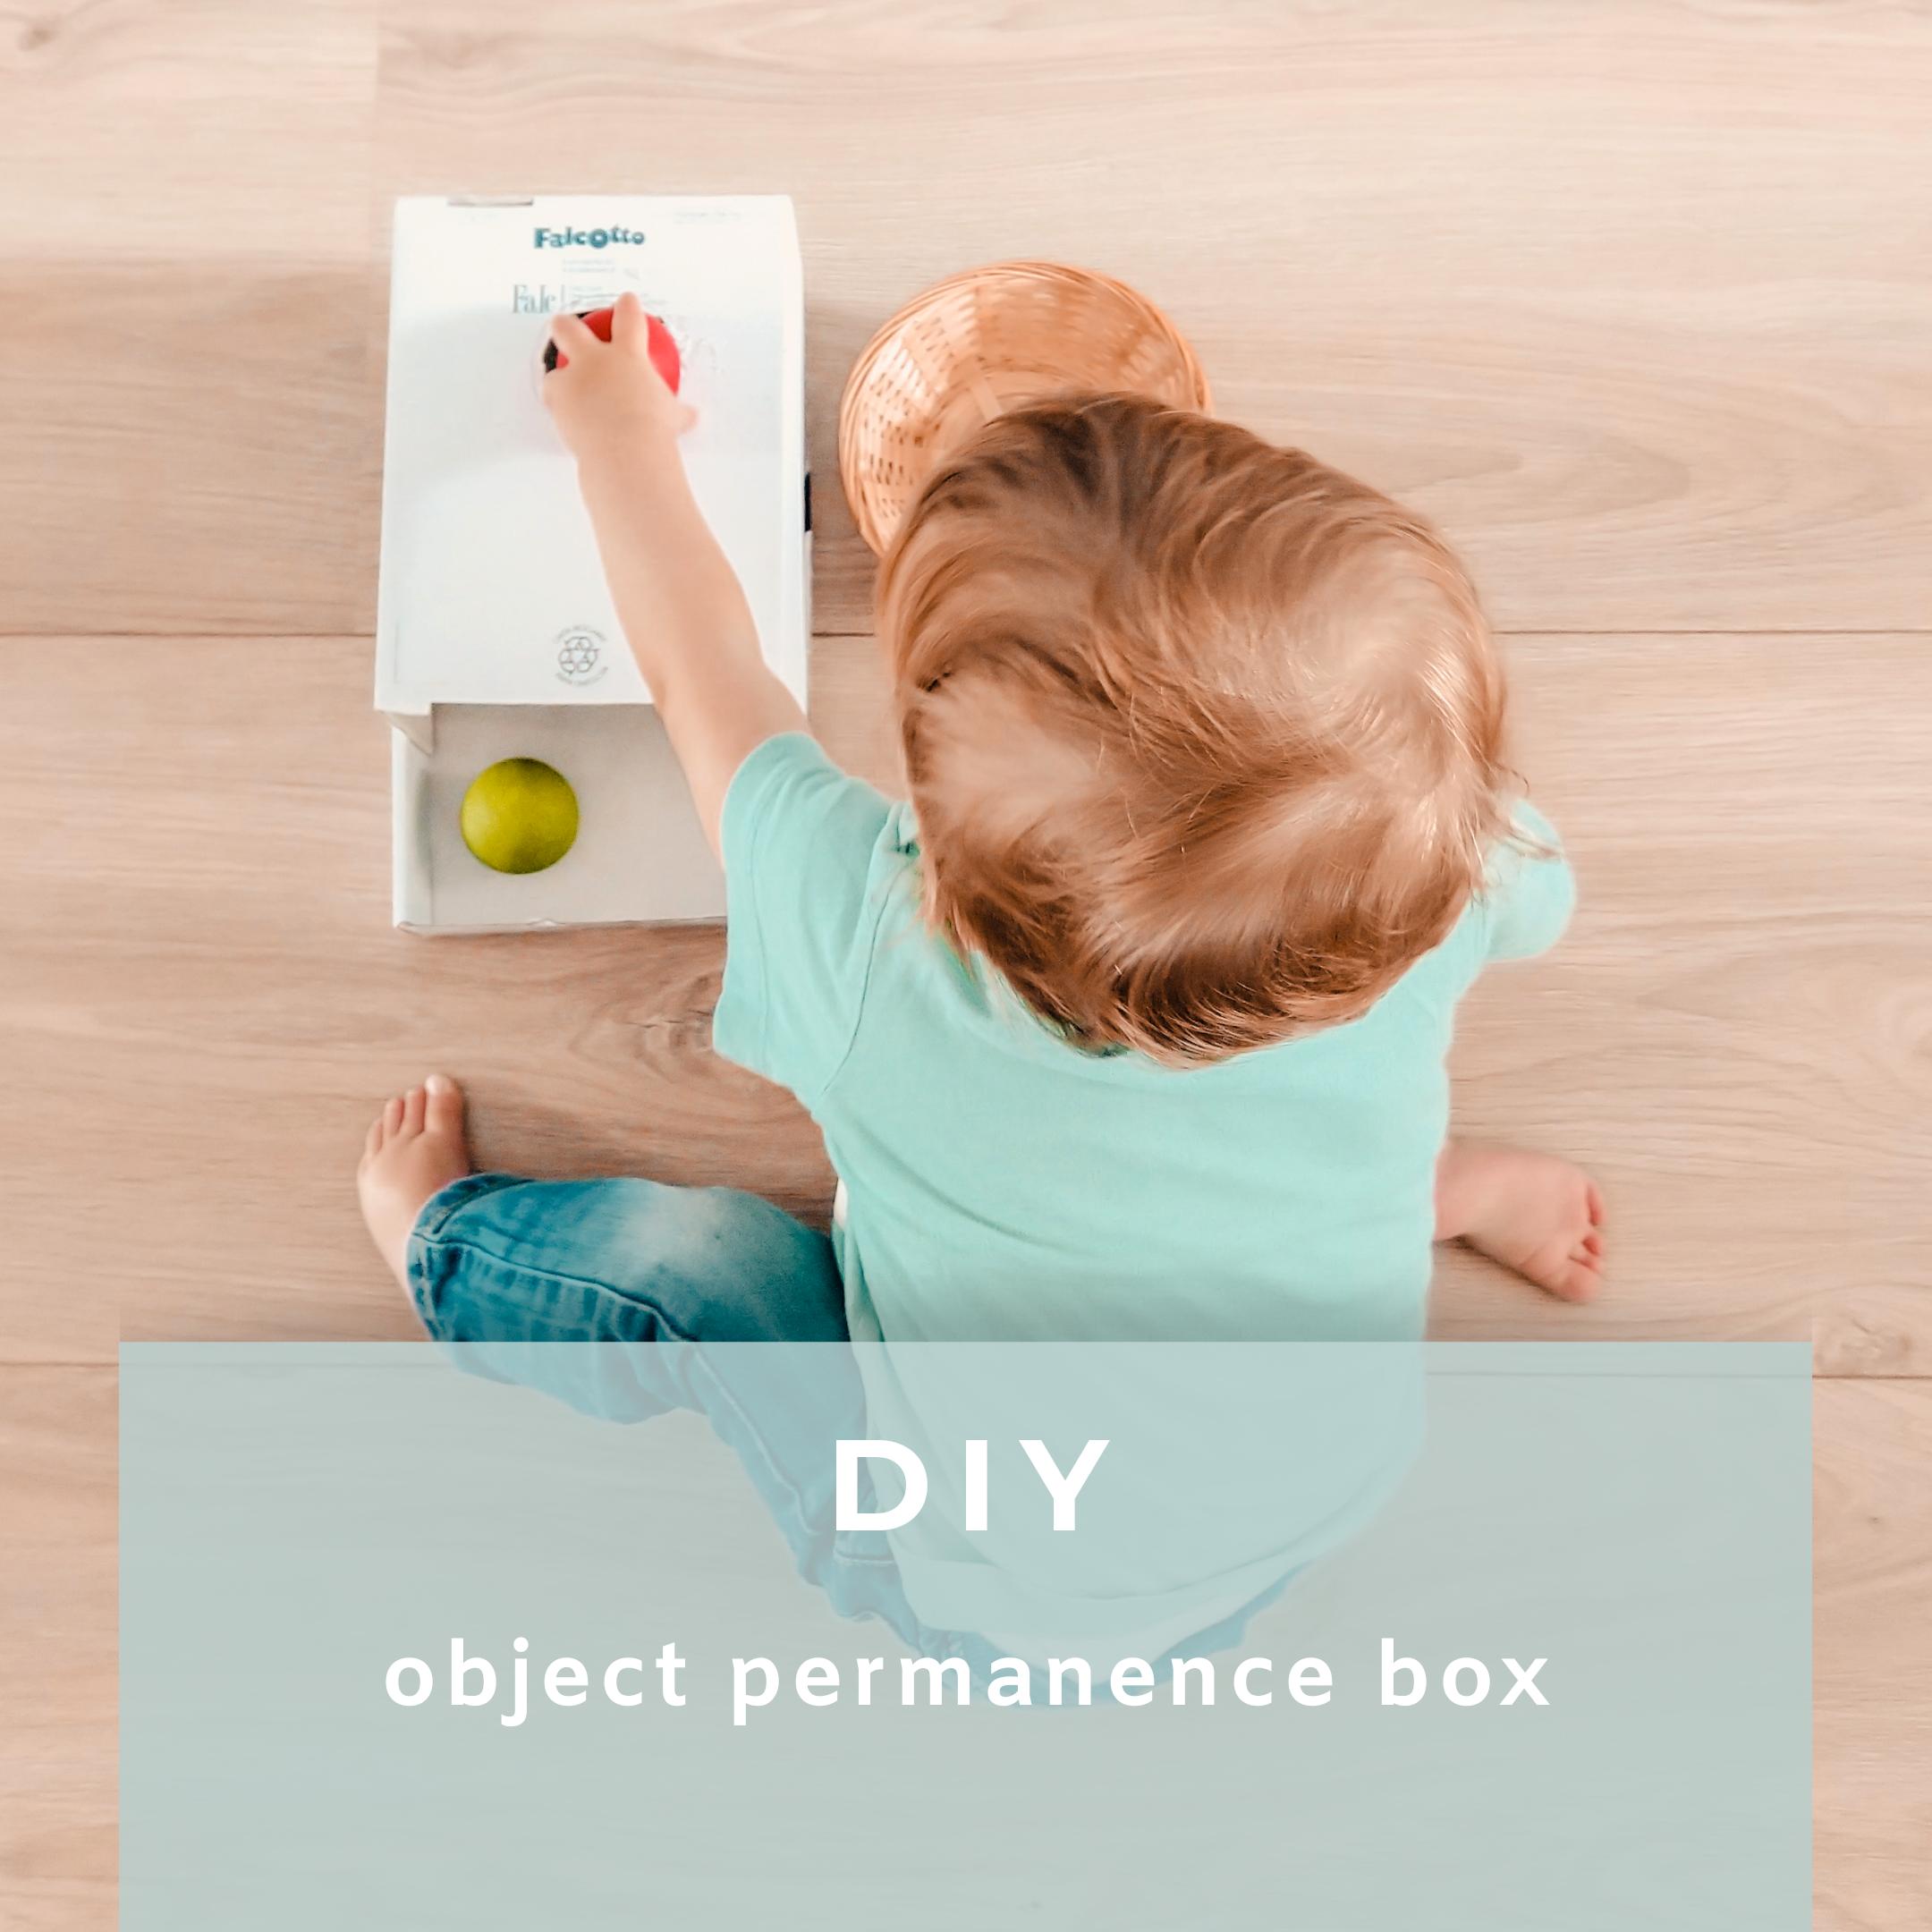 diy object permanence box